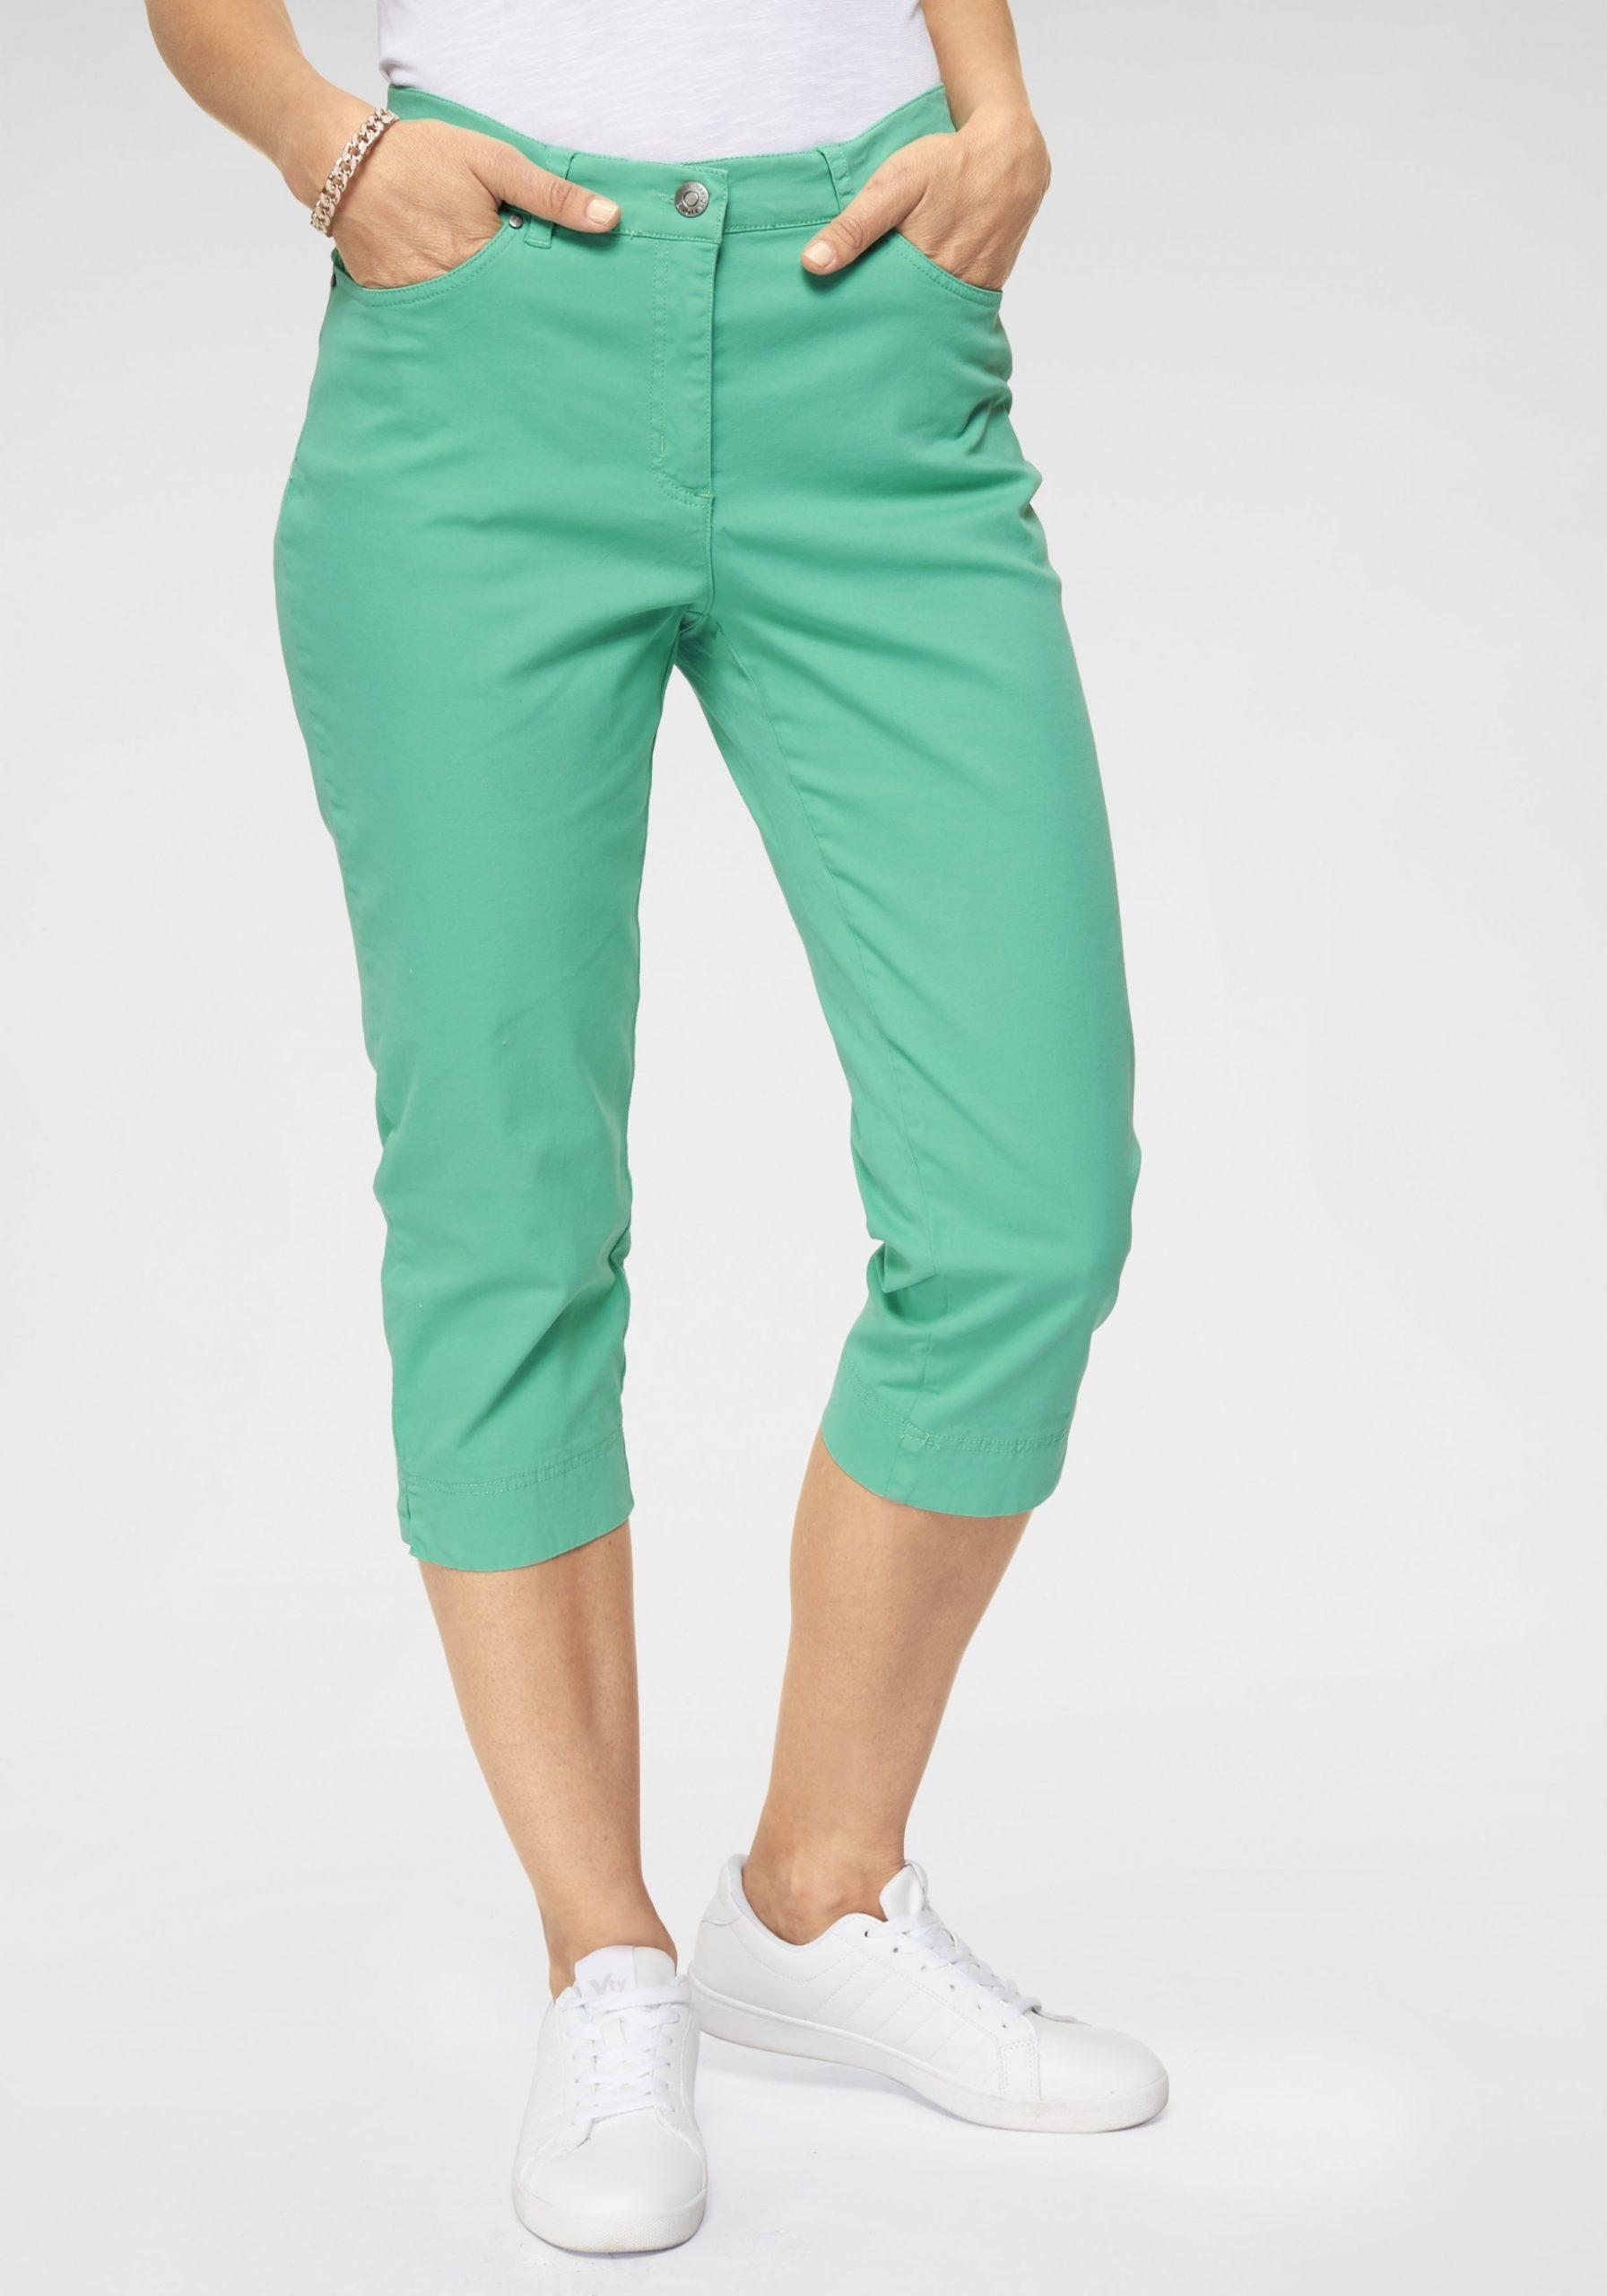 Damen Feste Caprihose in starker Farbe grün